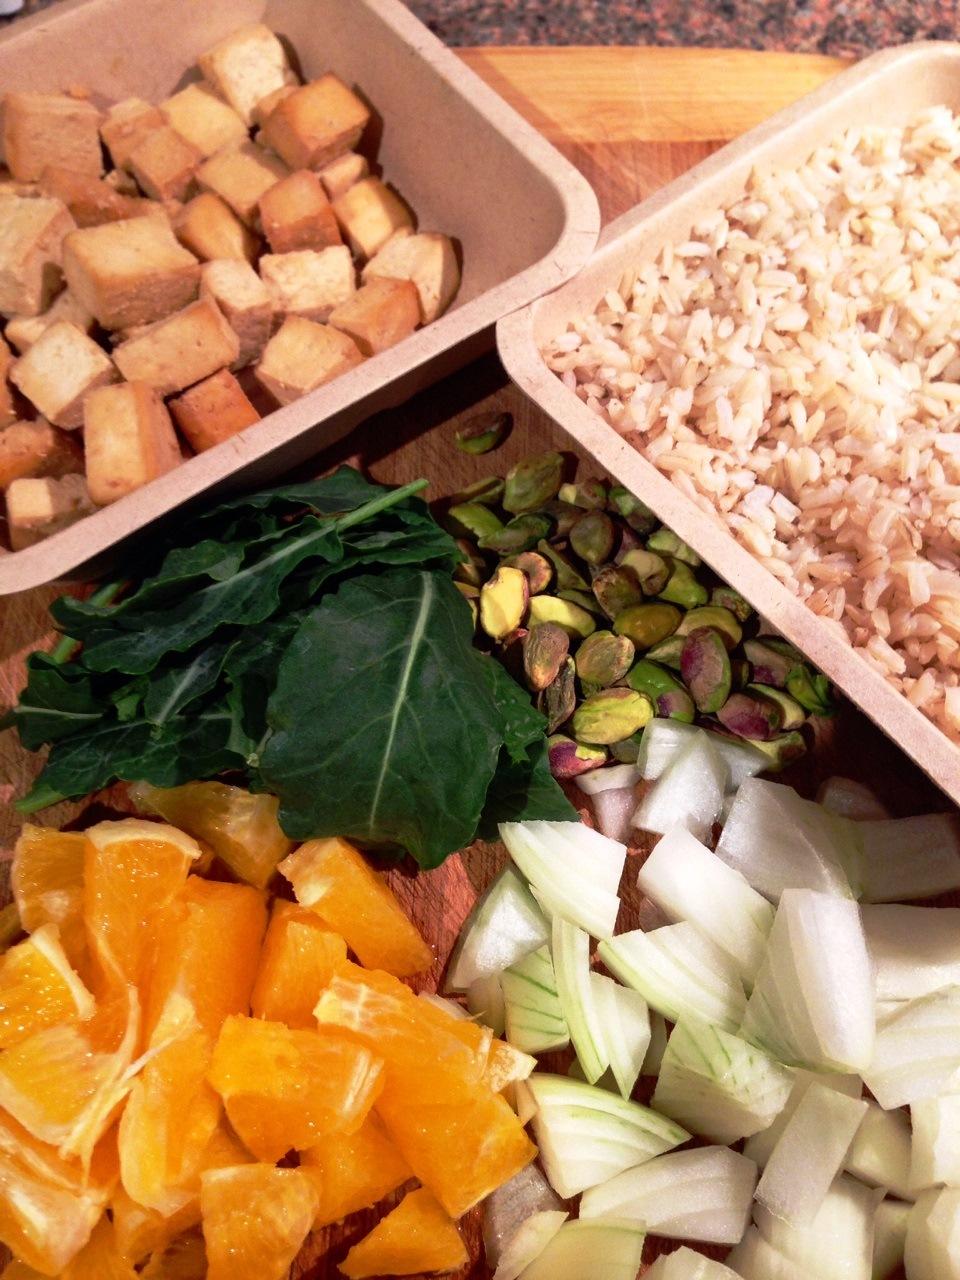 Pumpkin and Pistachio Stir Fry Ingredients